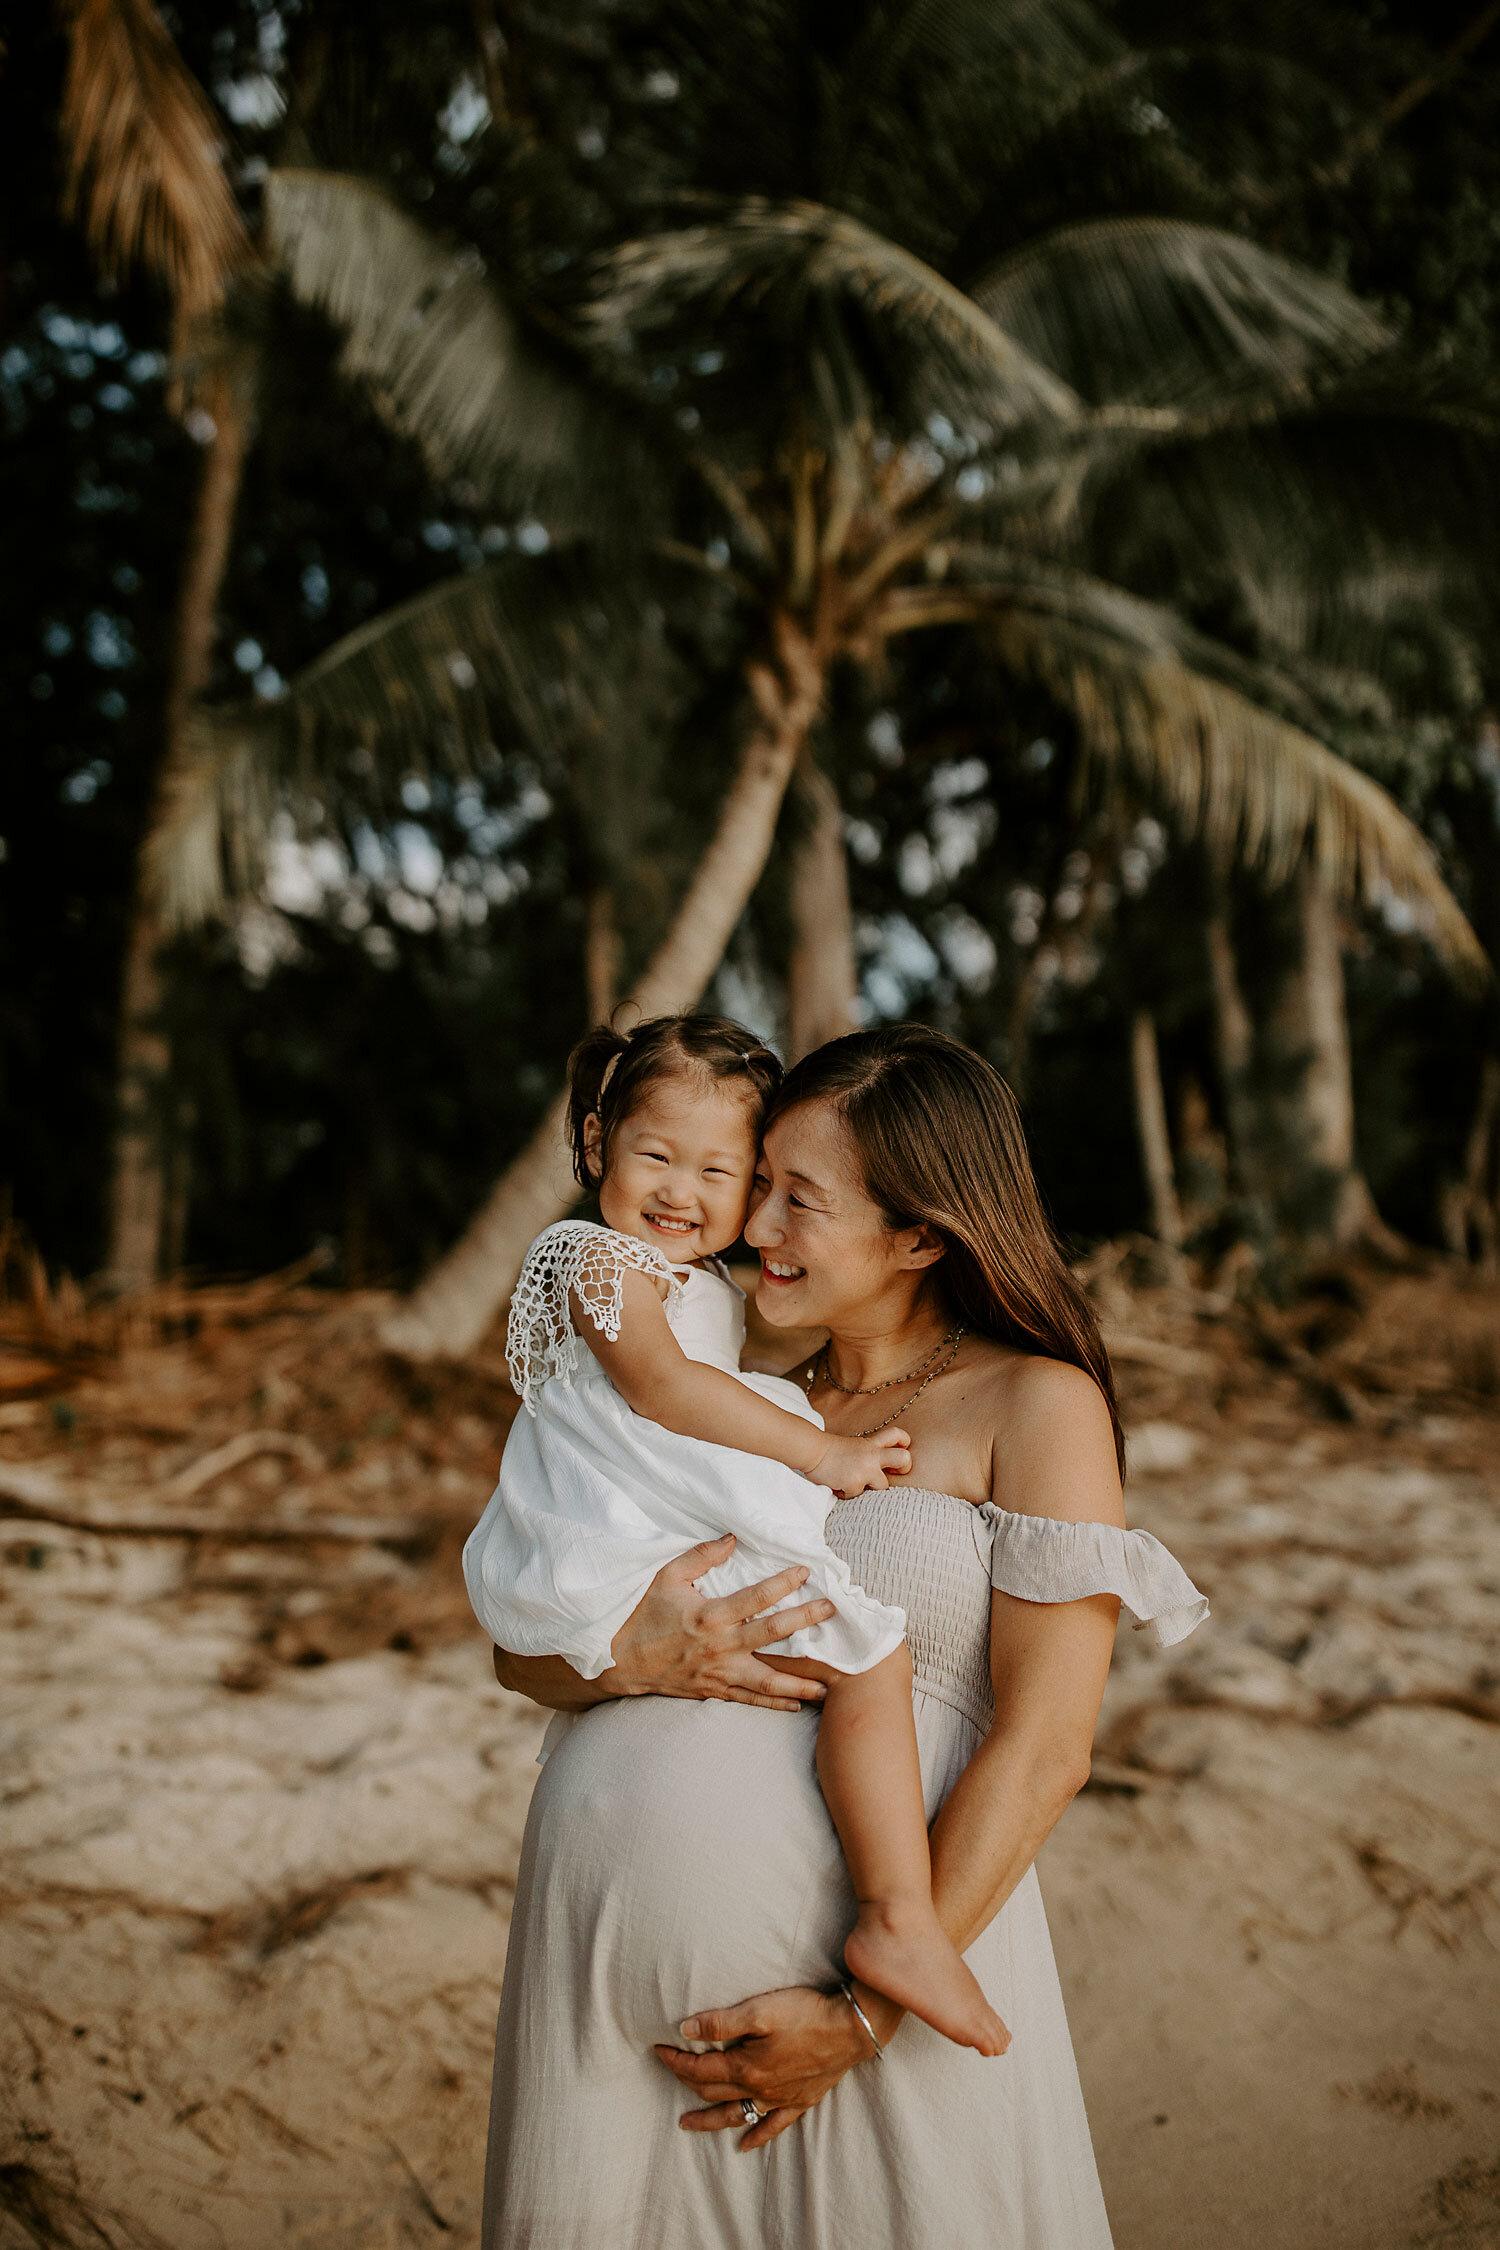 Oahu-Hawaii-North-Shore-Maternity-Photography-The-Sophia-Co-18.jpg